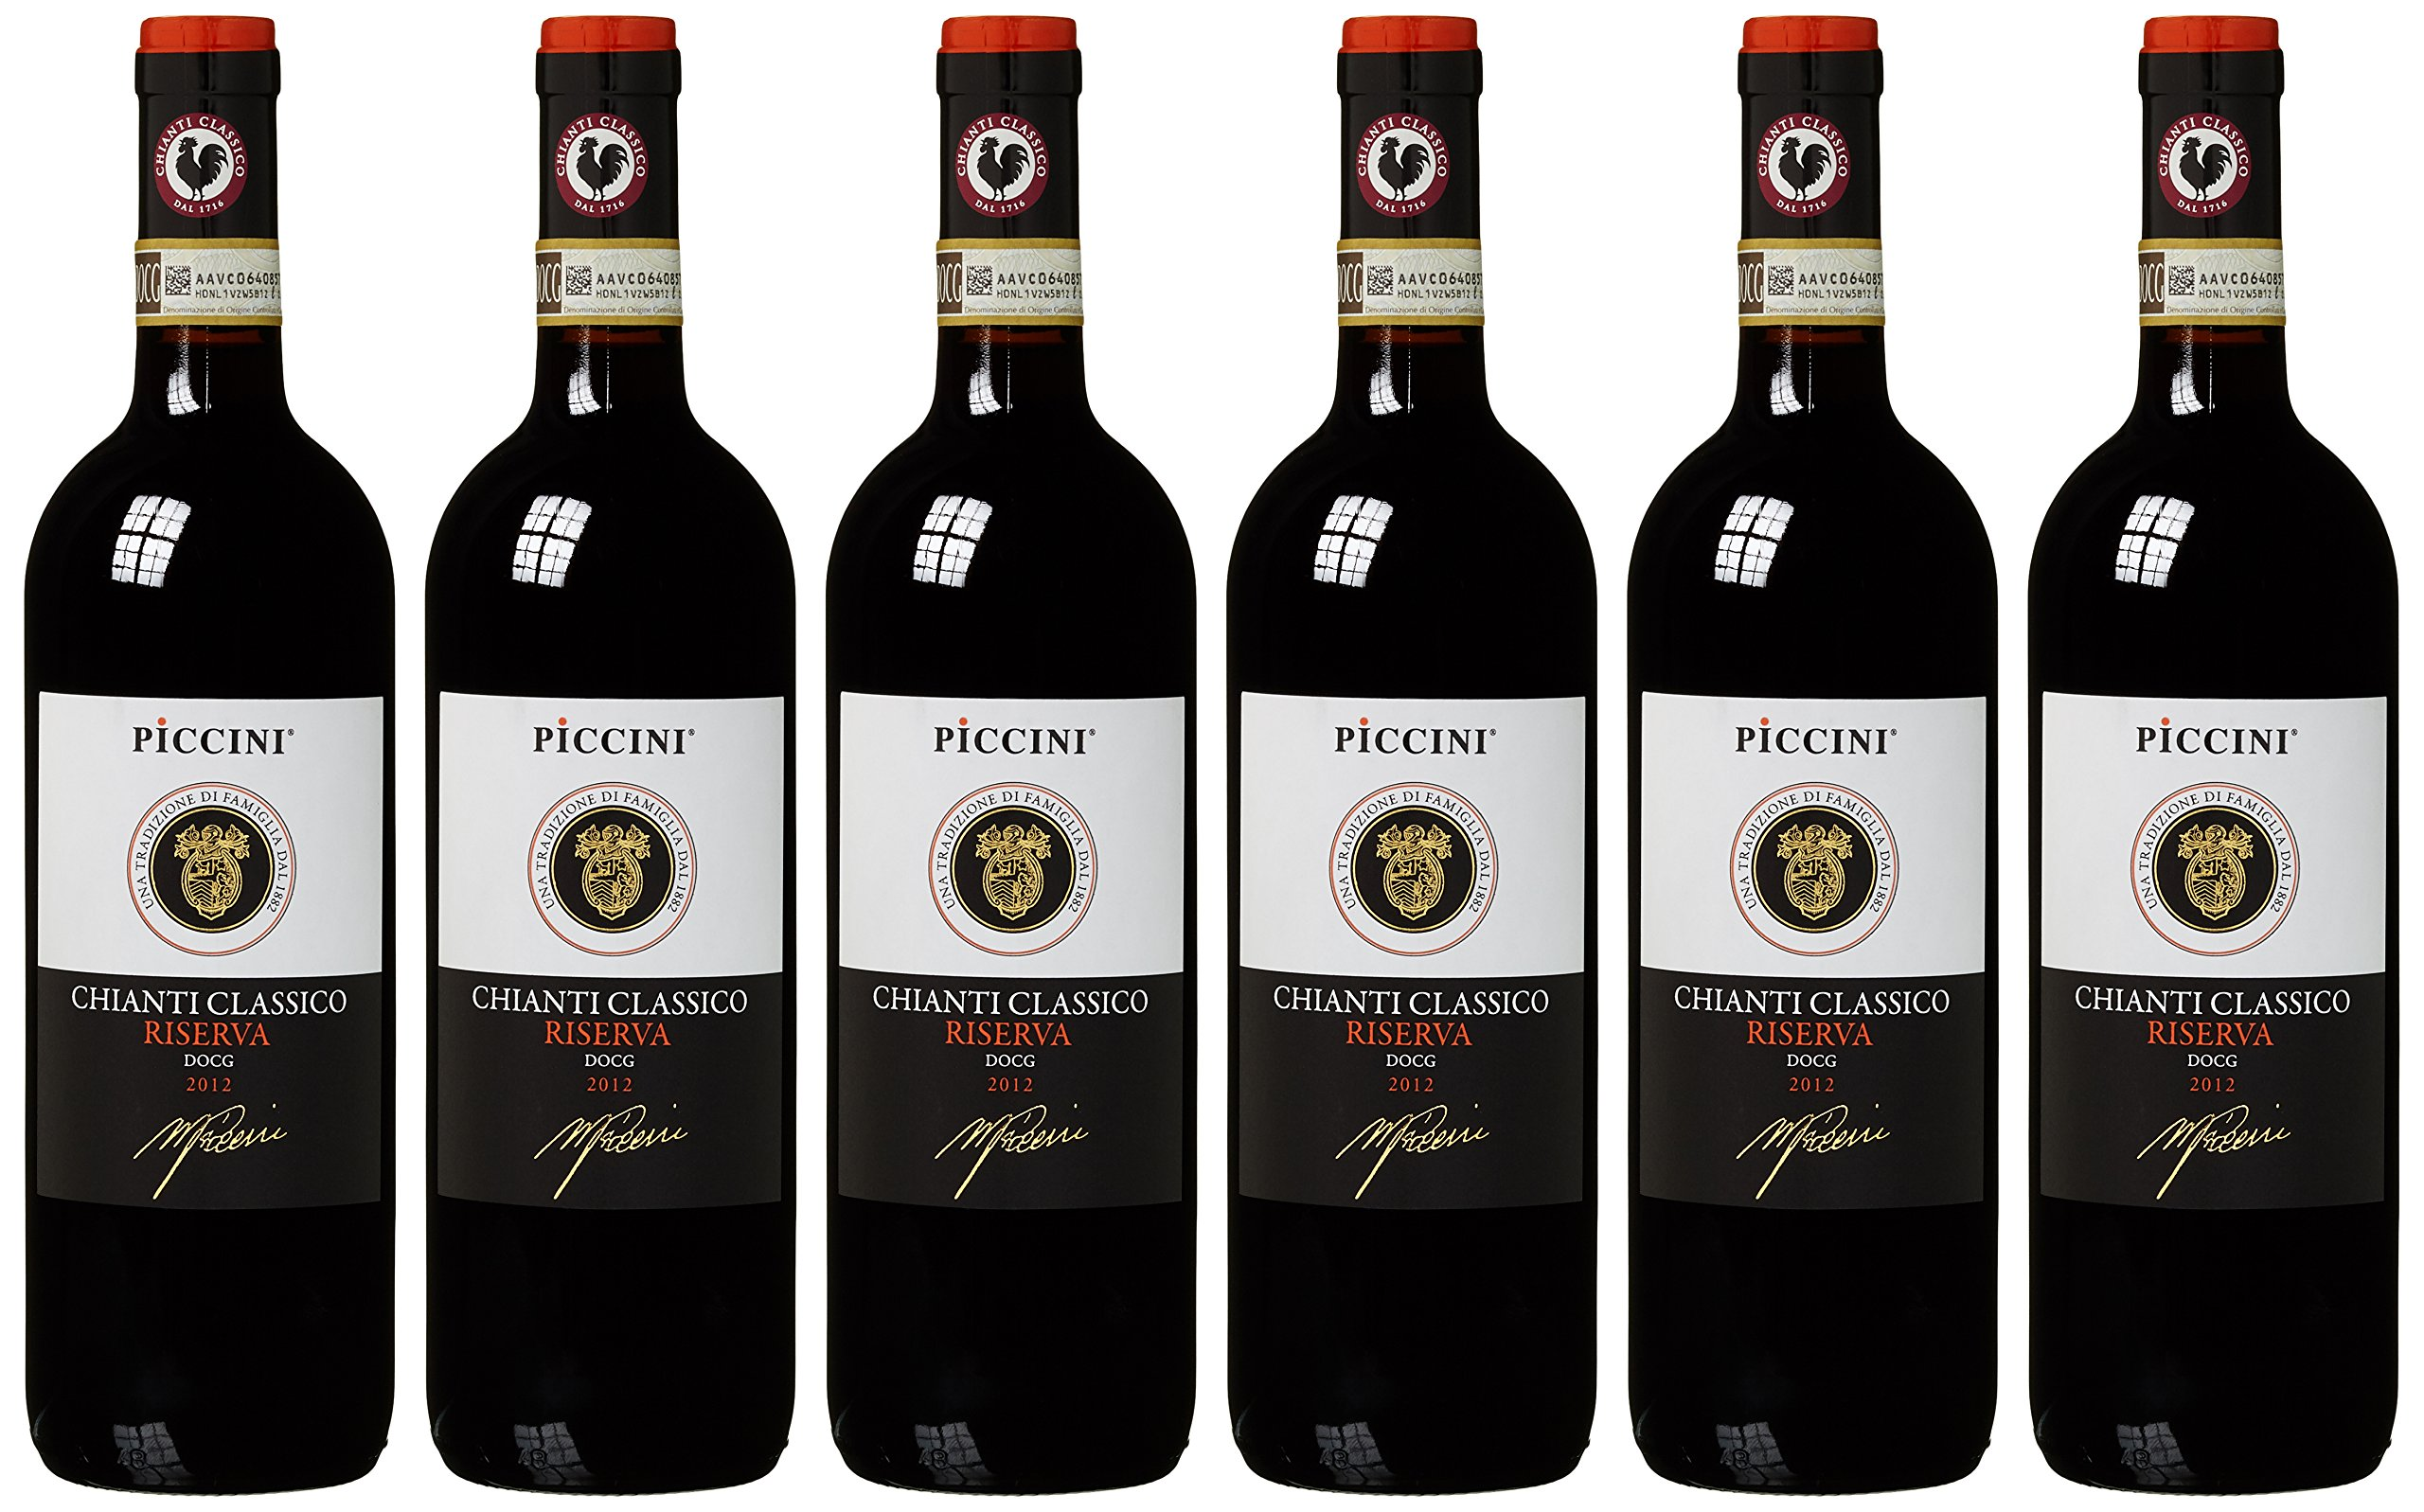 Piccini-Chianti-Classic-Riserva-DOCG-Chianti-6-x-075-l